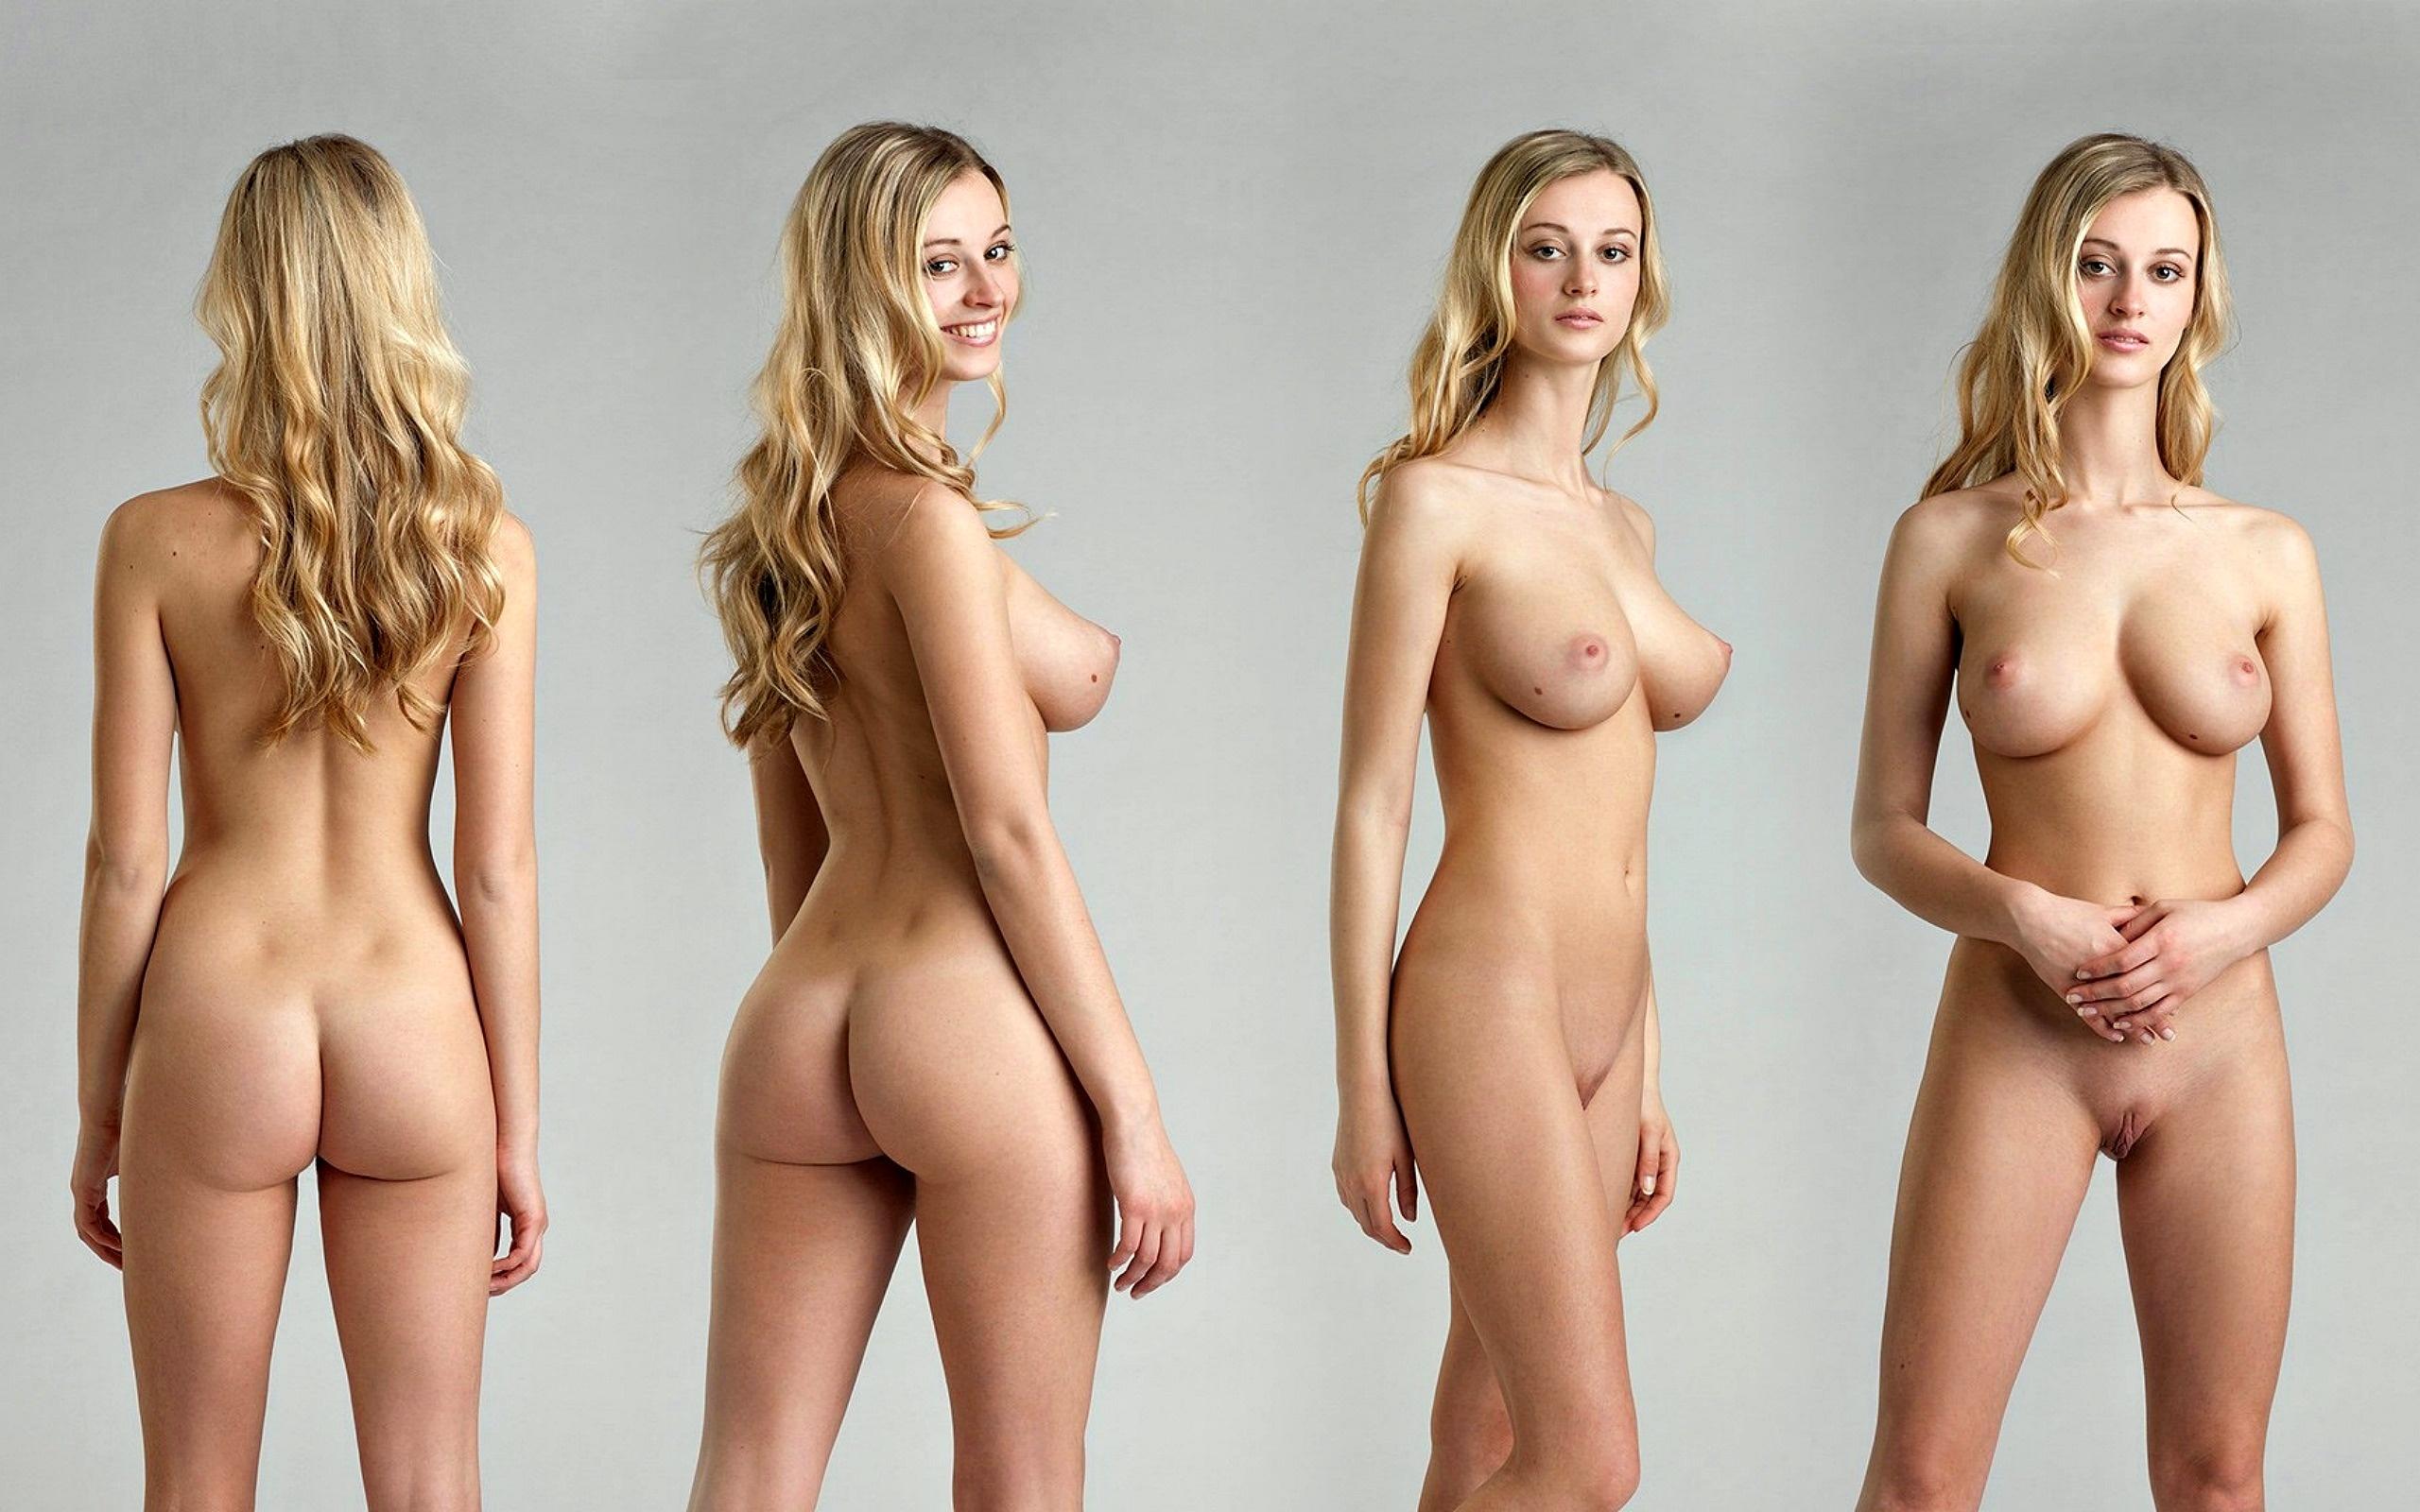 Teen nude female models